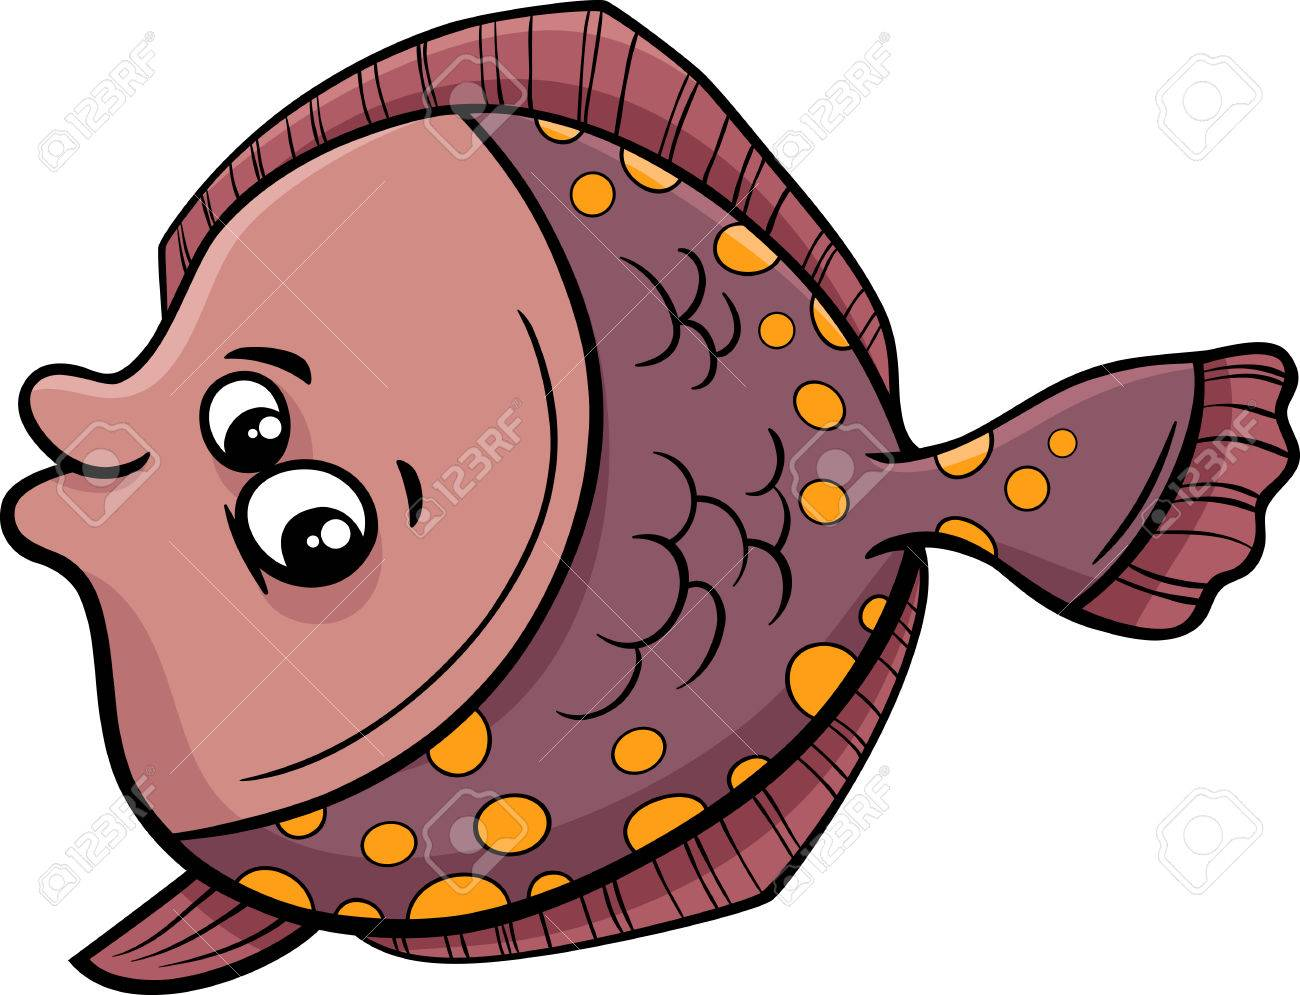 Cartoon Illustration of Funny Flounder Fish Sea Life Animal - 43134792